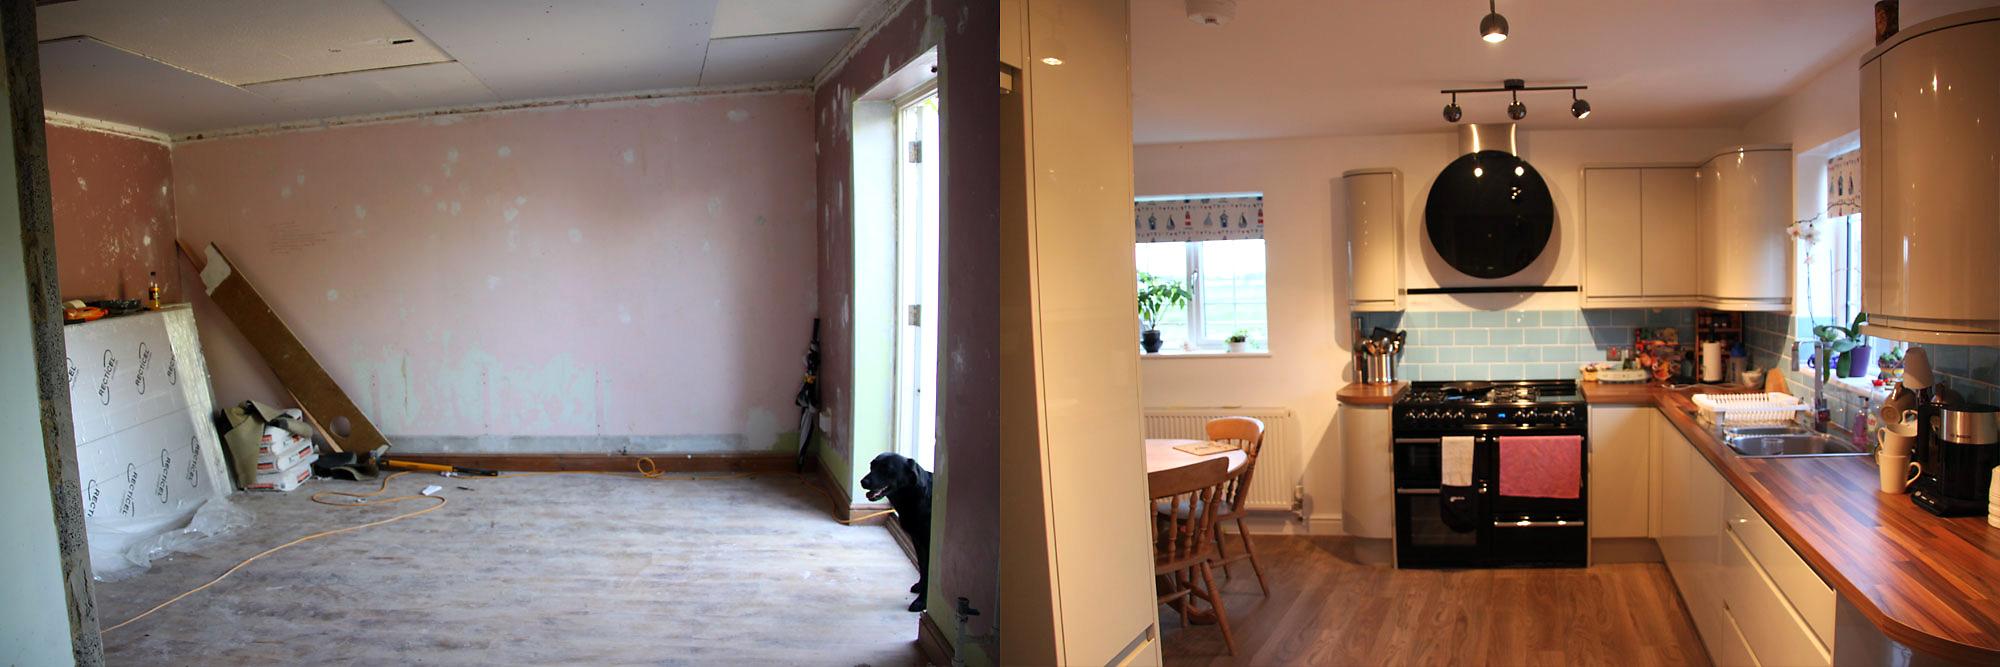 brickhurst-construction-northiam-rye-peasmarsh